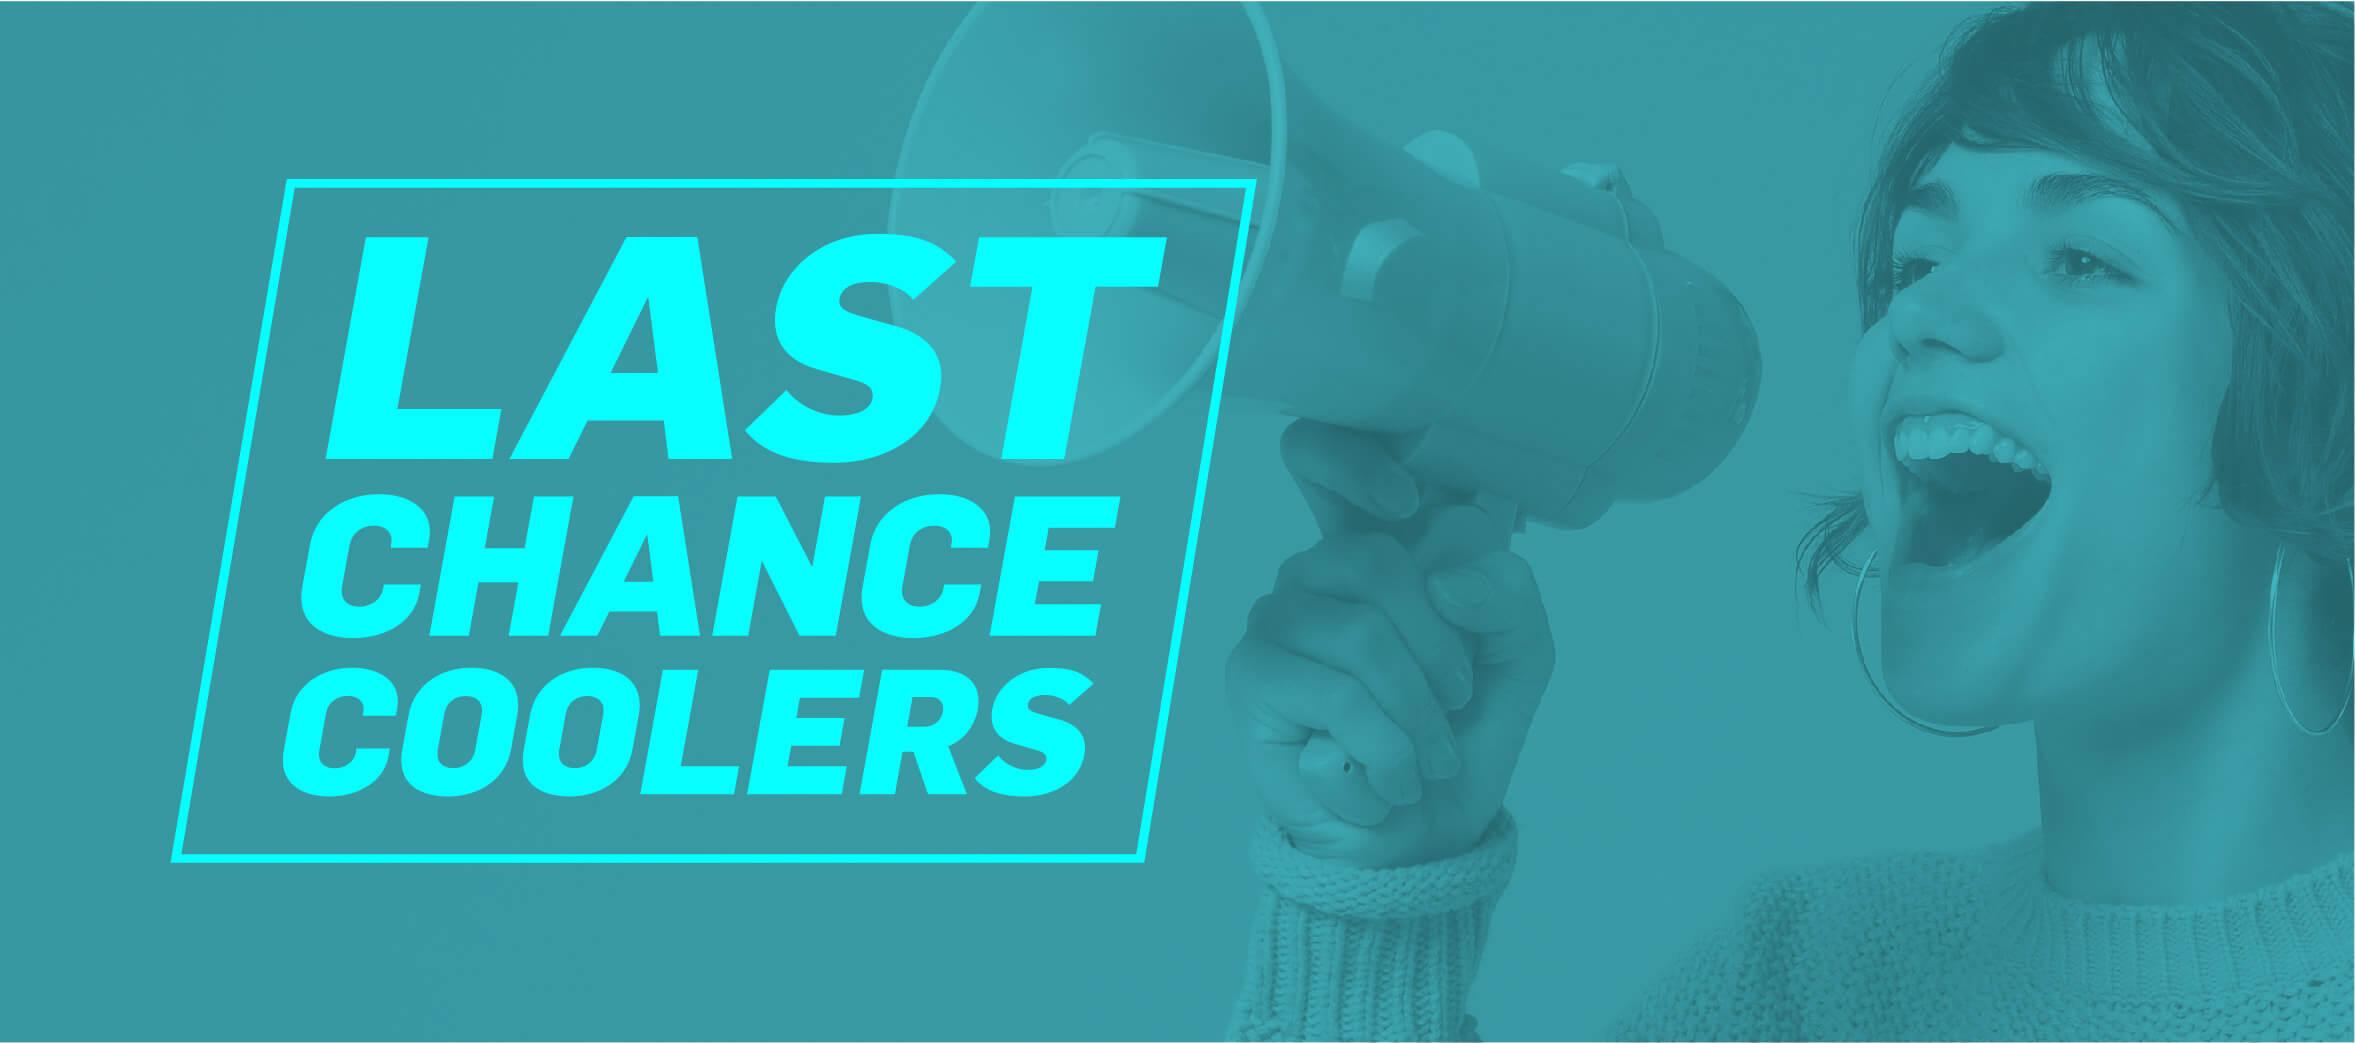 p6-20-last-chance-coolers-header-en